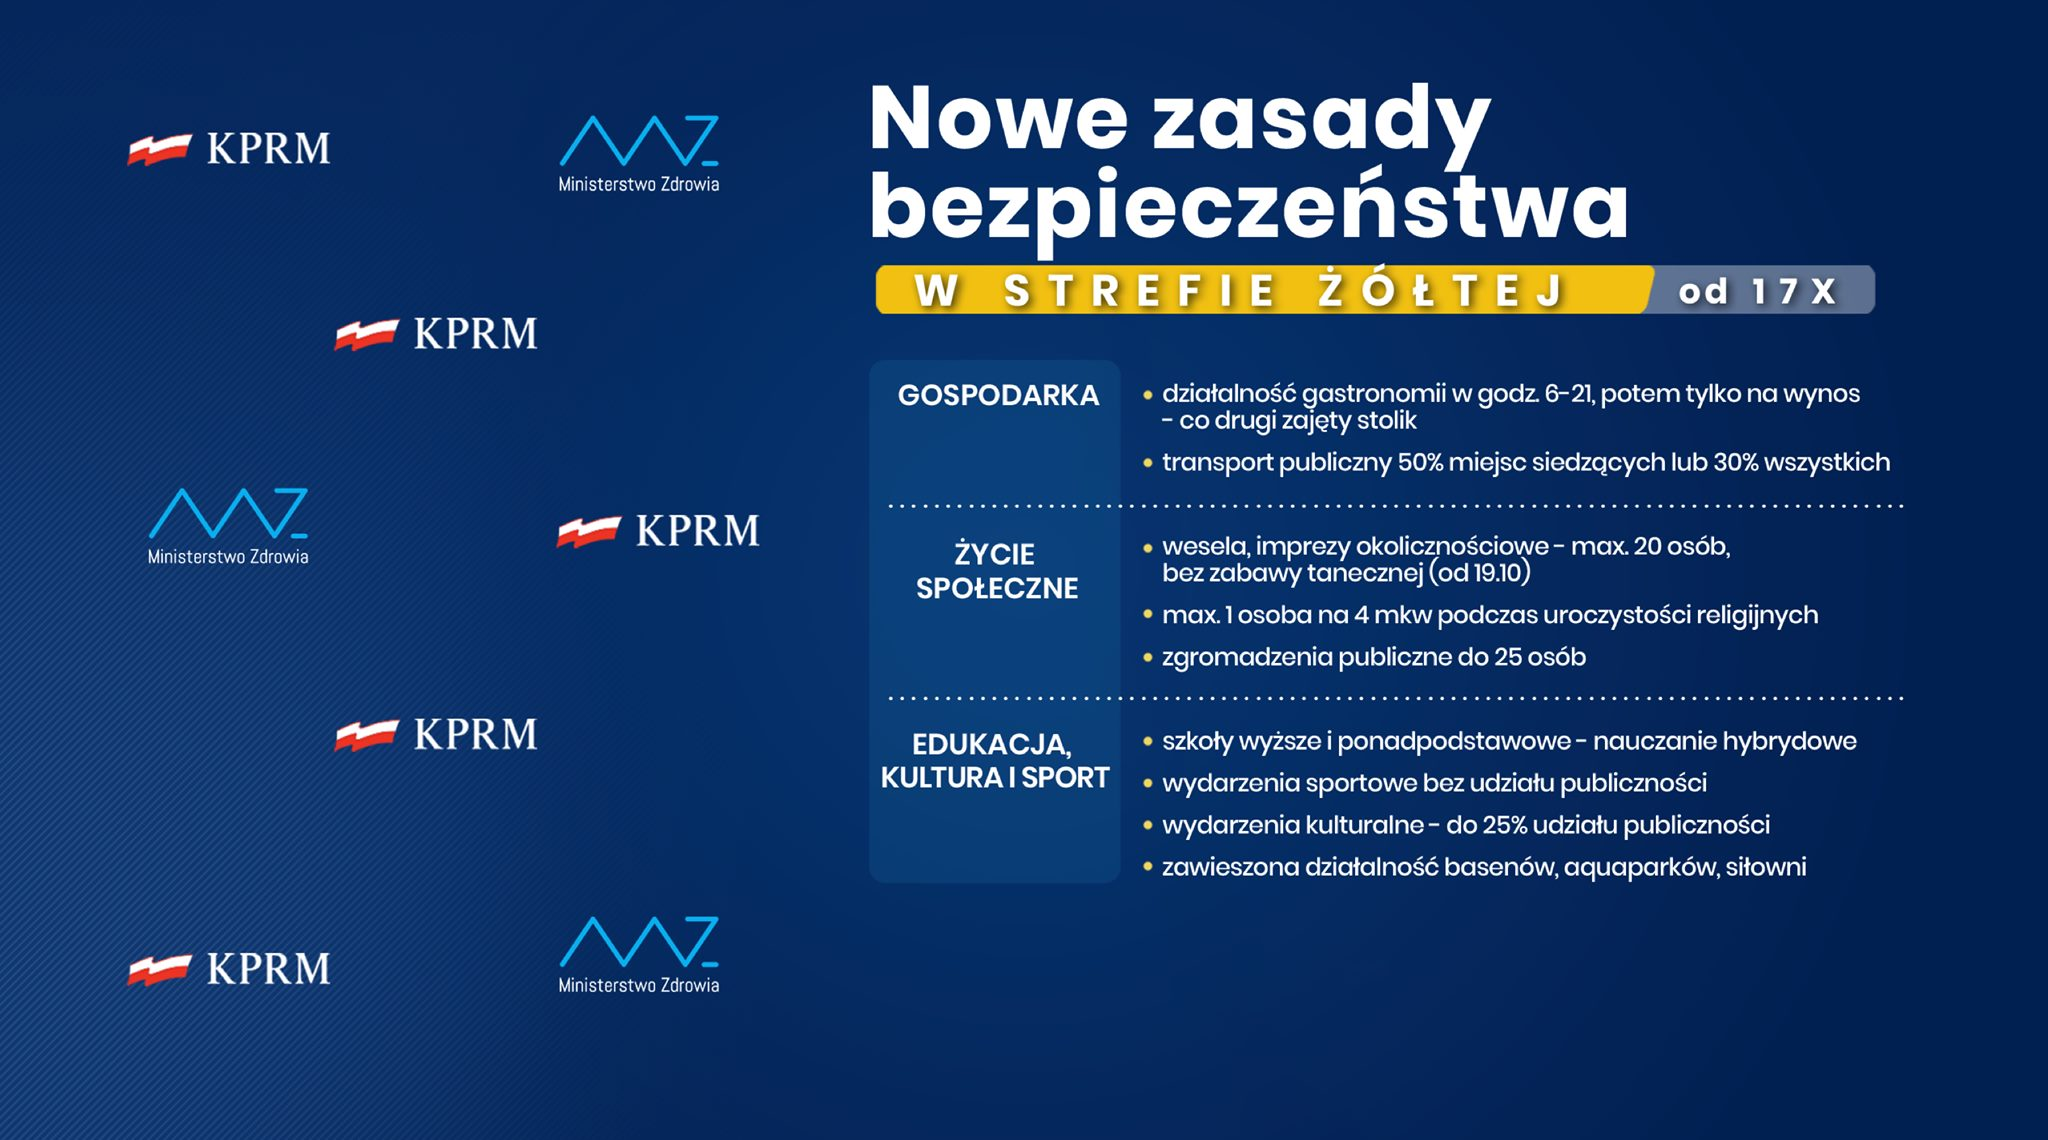 http://m.82-200.pl/2020/10/orig/zolta-6537.jpg